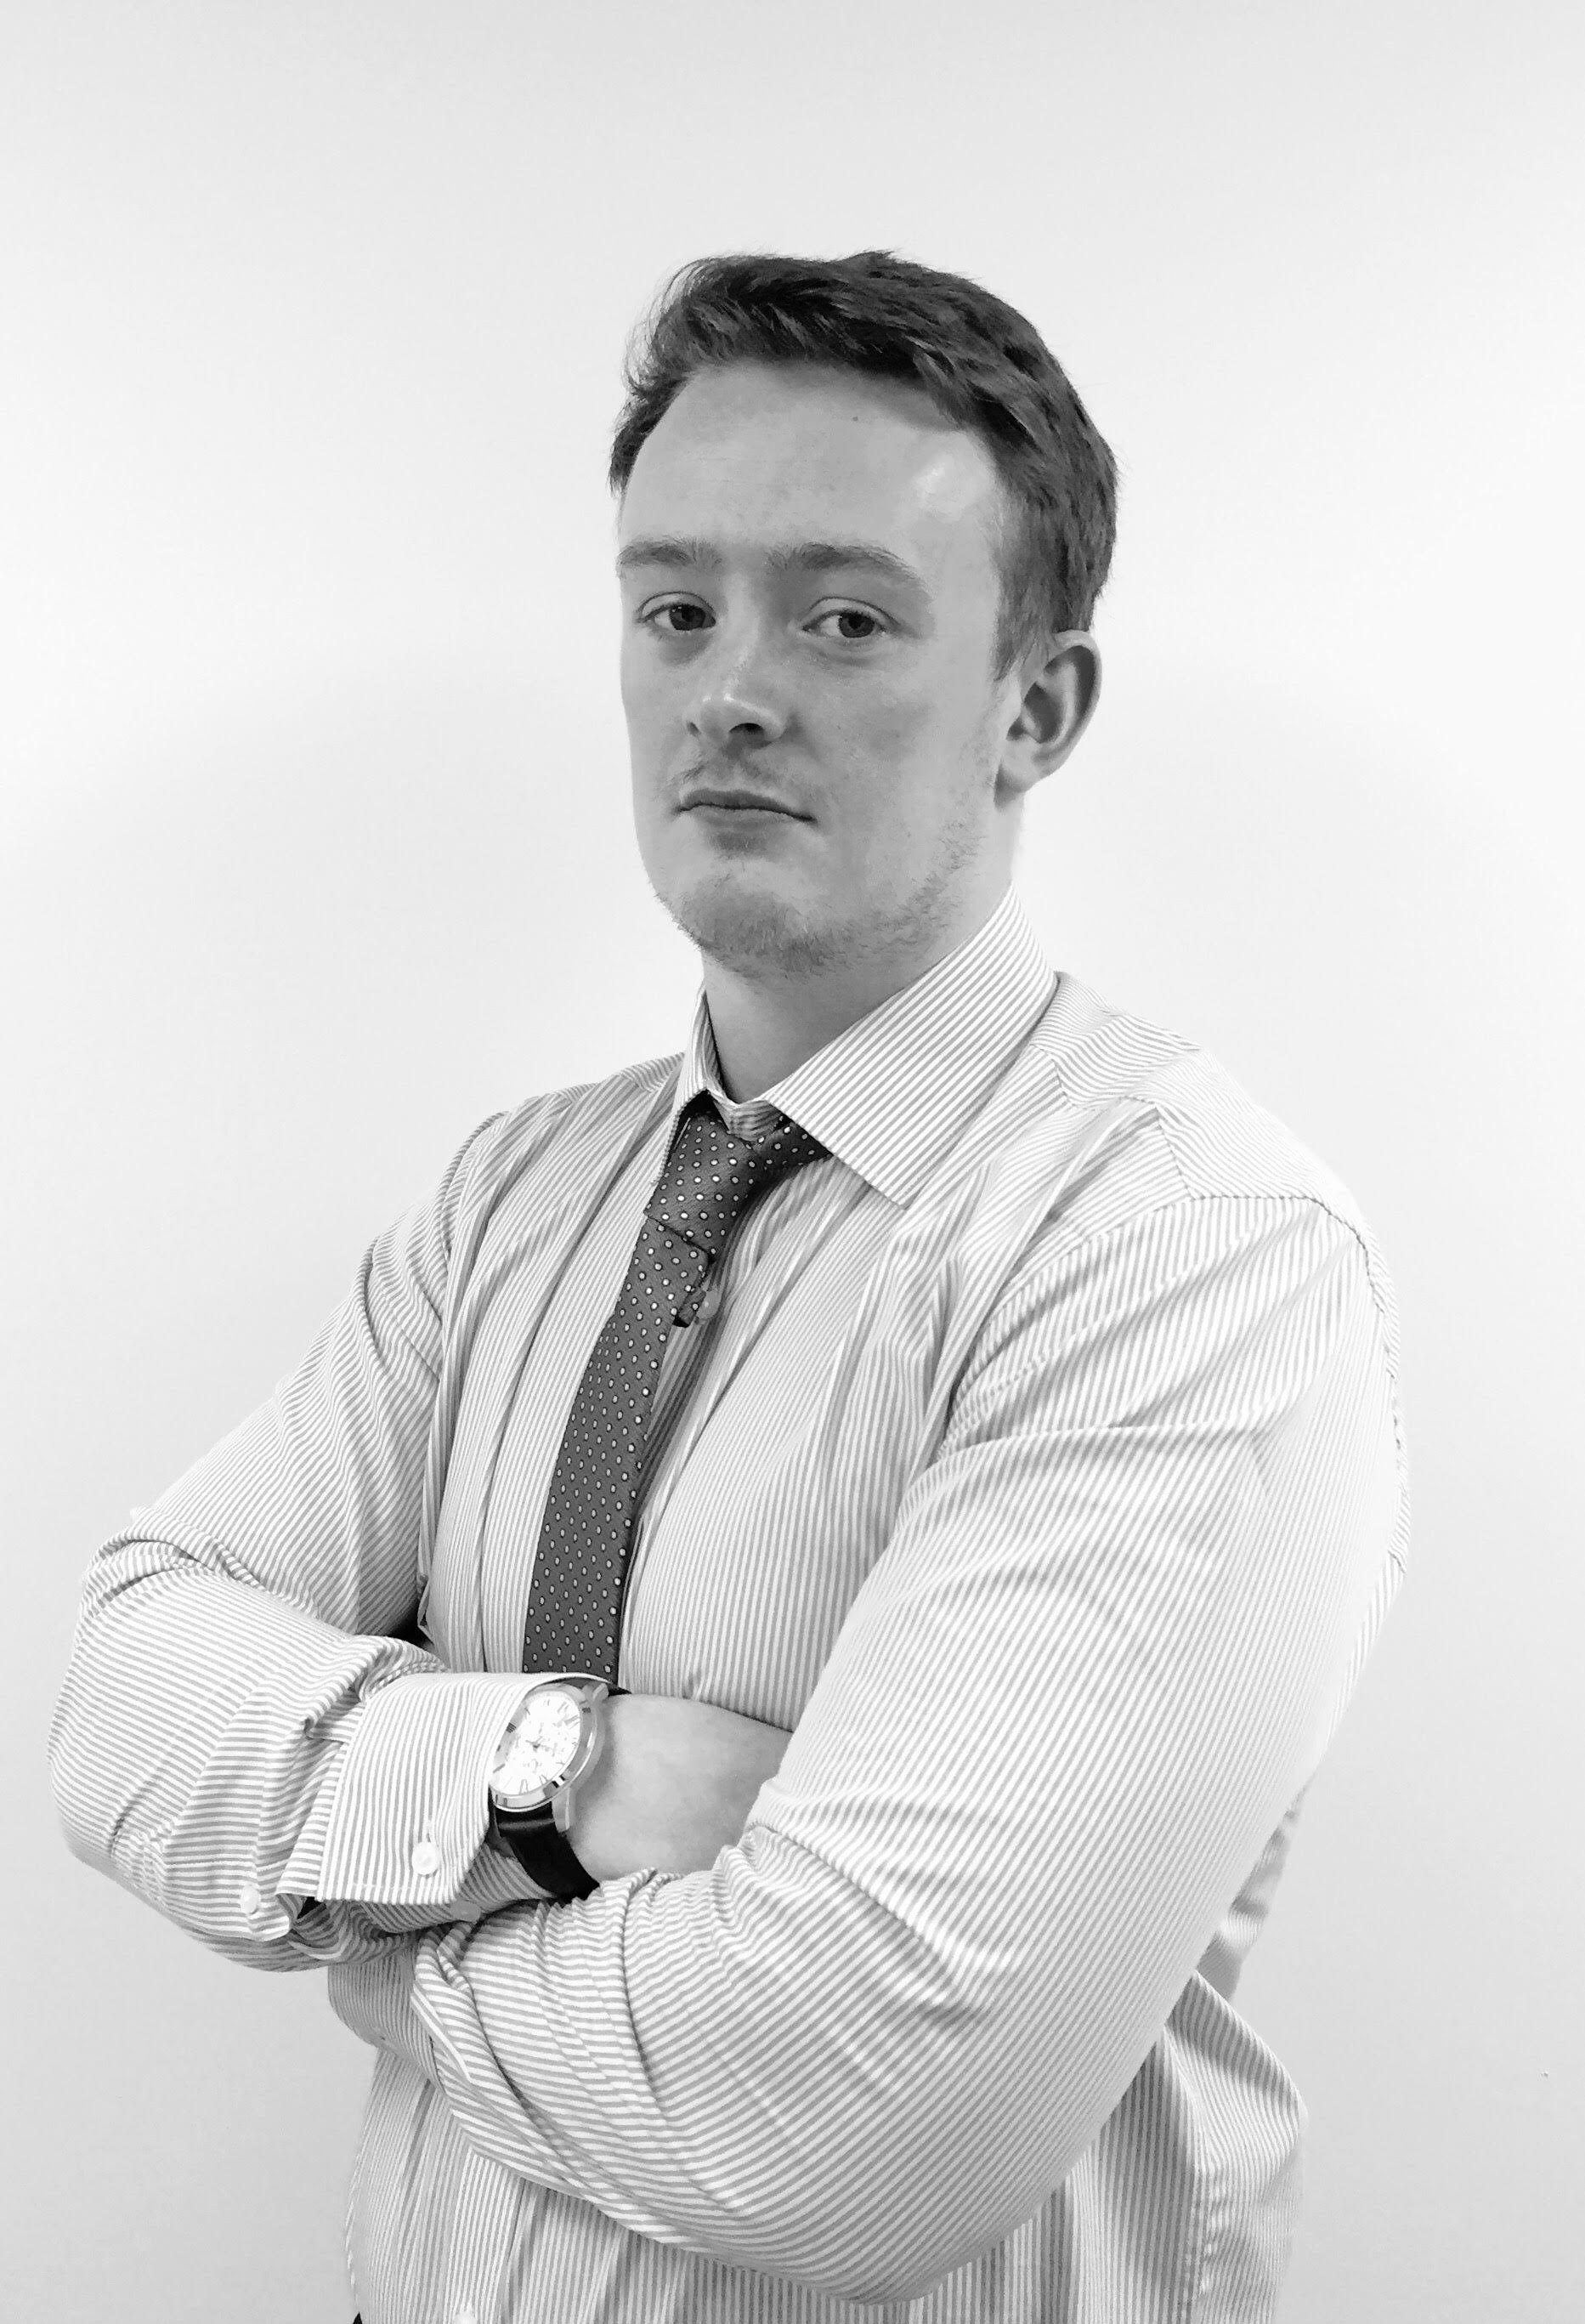 Jonny Campbell Headshot